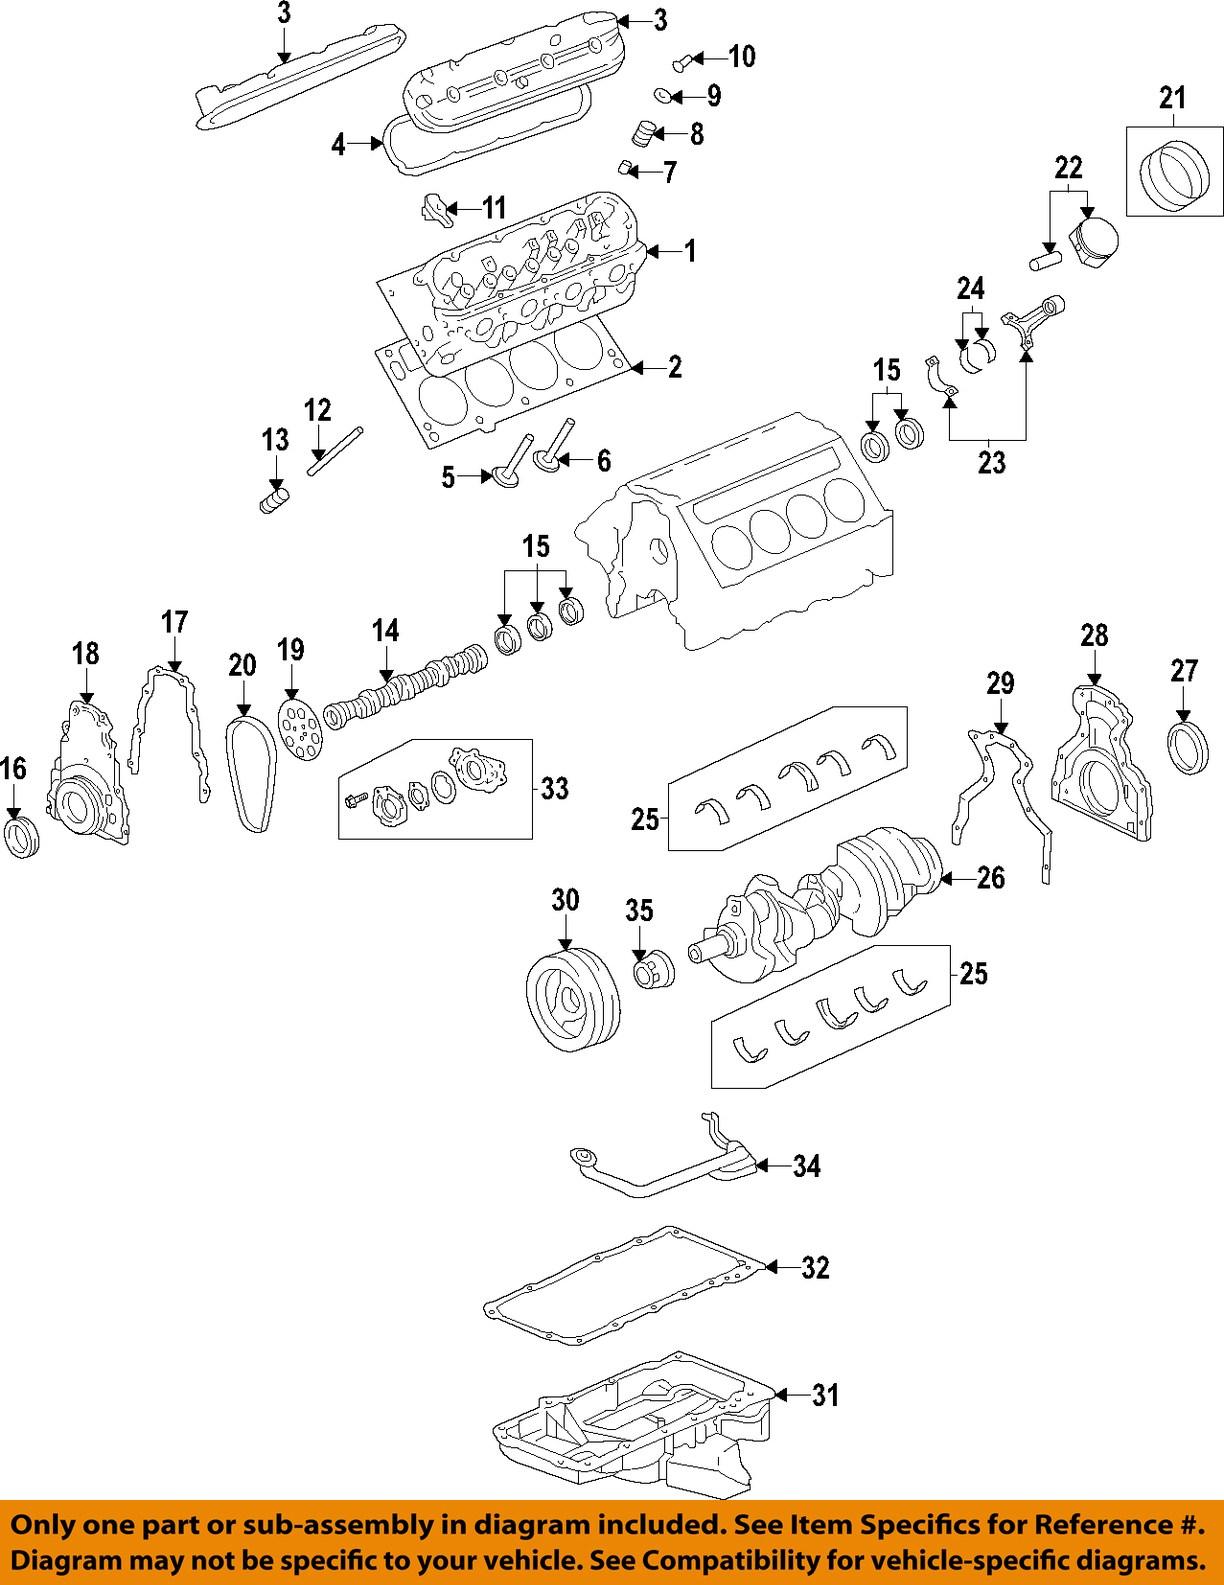 hight resolution of gm oem engine intake valve 12563063 ebay gm power steering diagram 5 on diagram only genuine